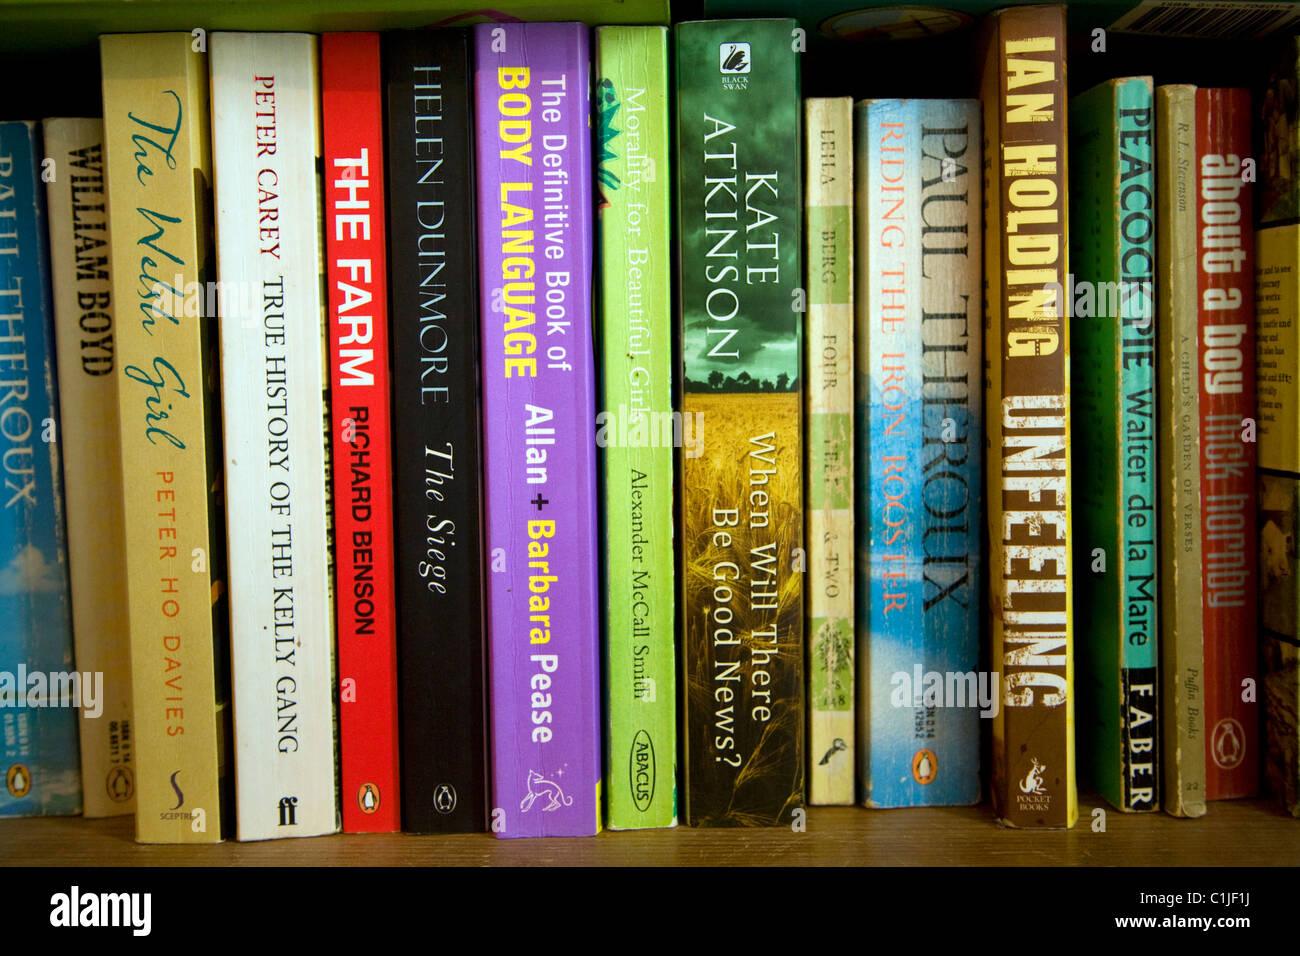 Novels paperback books bookshelf - Stock Image